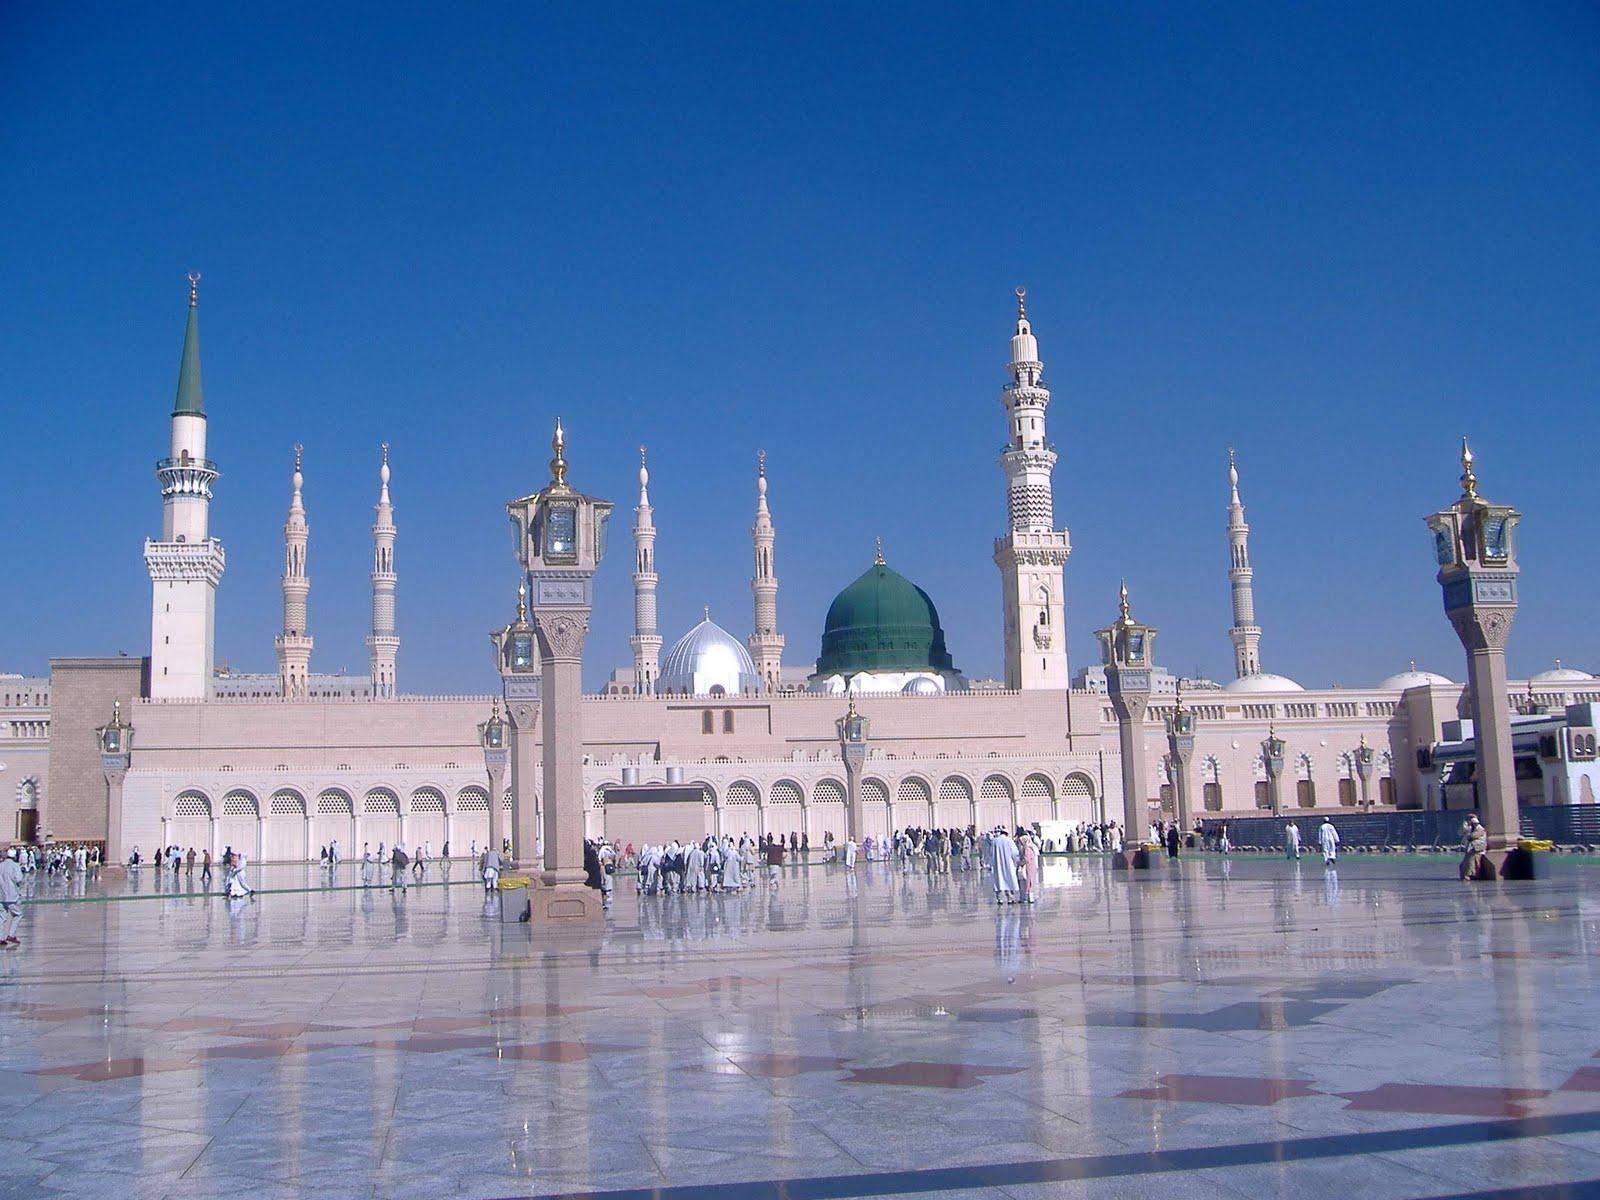 FULL WALLPAPER: Masjid-e-Nabvi Wallpapers